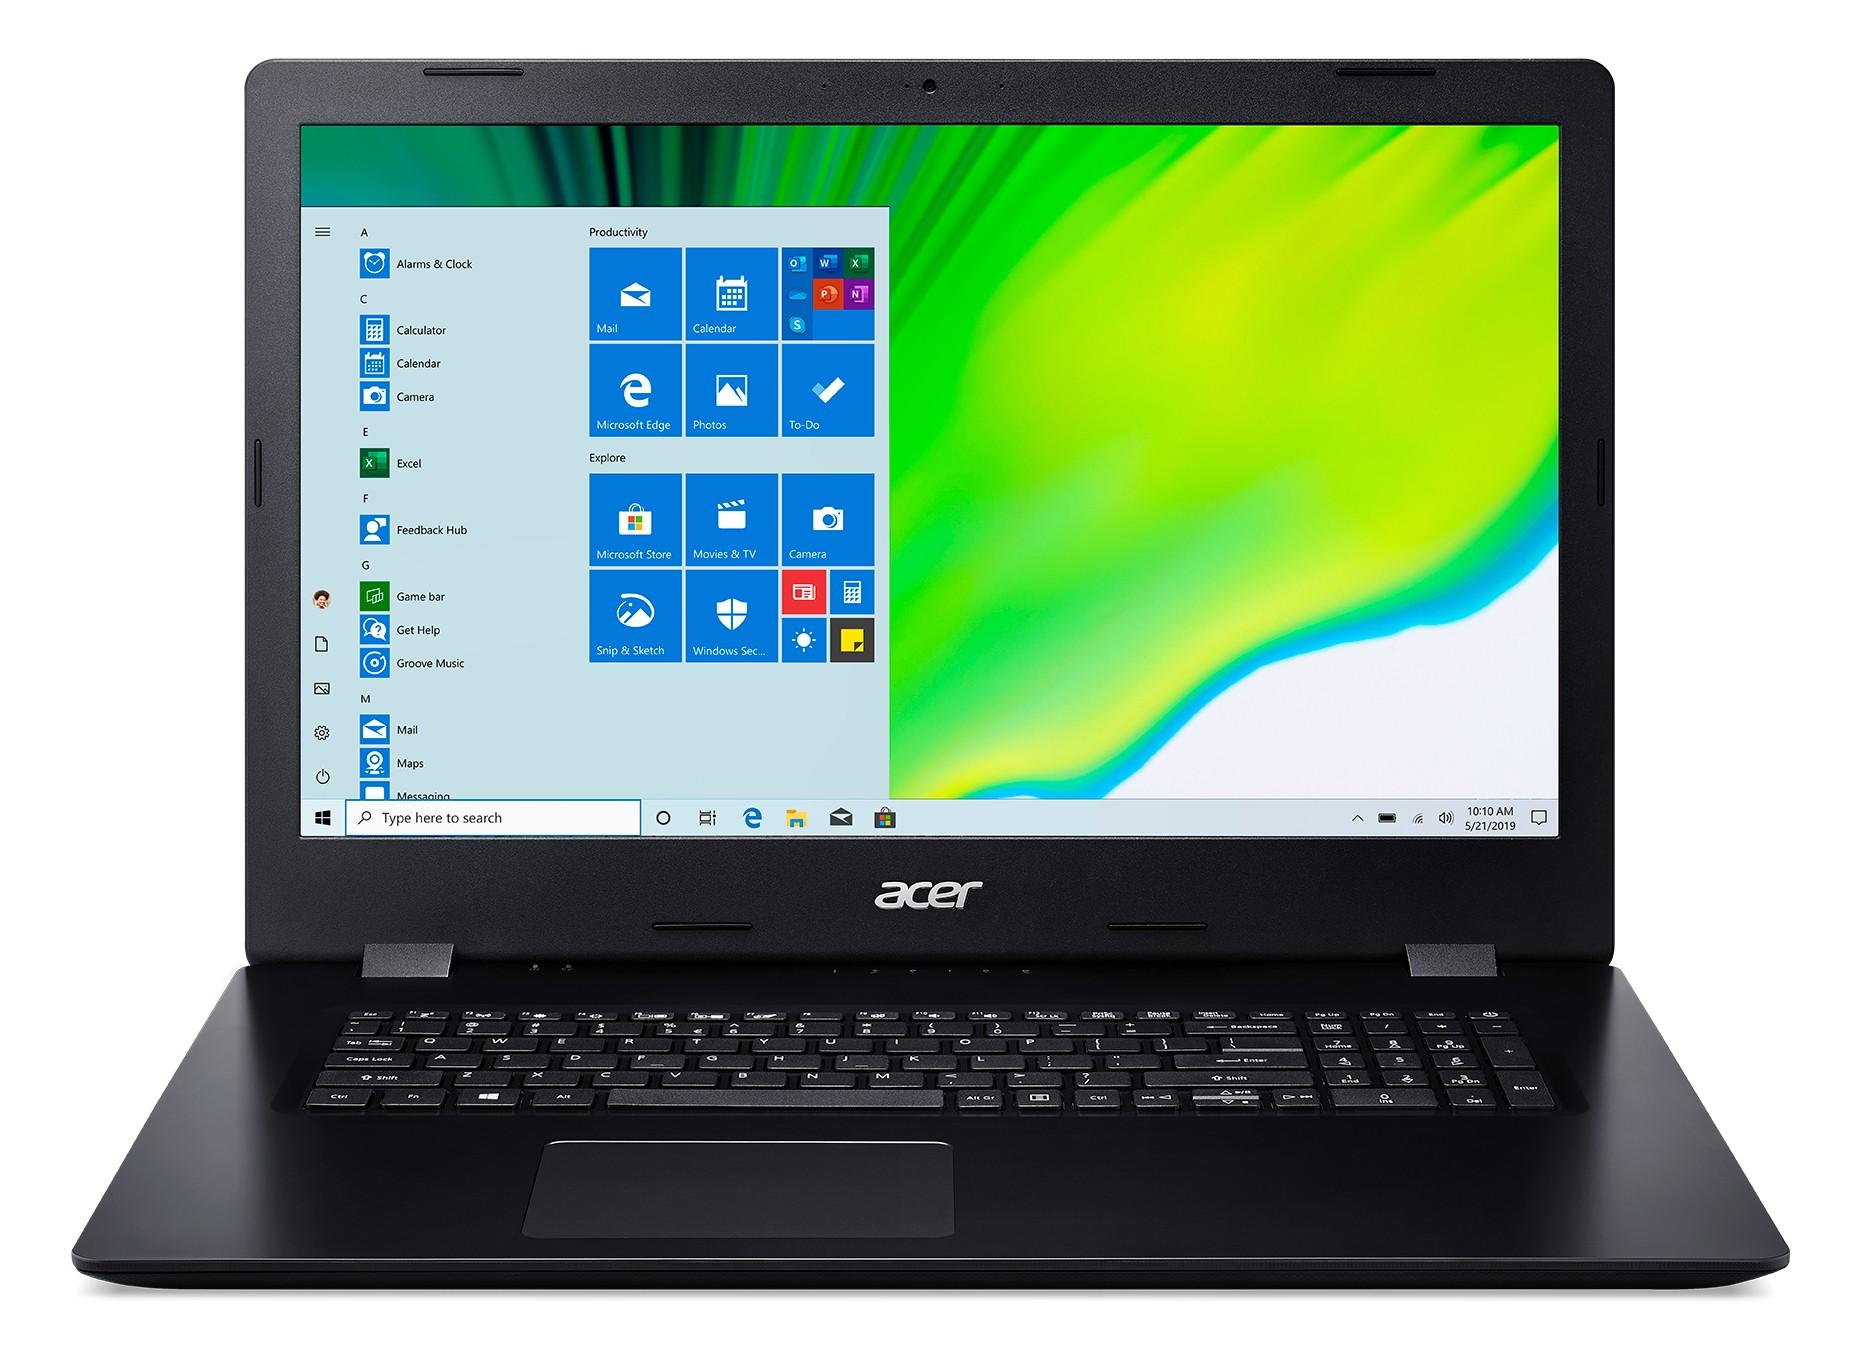 "Acer Aspire 3 A317-52-31Y5 Notebook 43,9 cm (17.3"") 1600 x 900 Pixels Intel® 10de generatie Core™ i3 4 GB DDR4-SDRAM 256 GB SSD Wi-Fi 5 (802.11ac) Windows 10 Home Zwart"